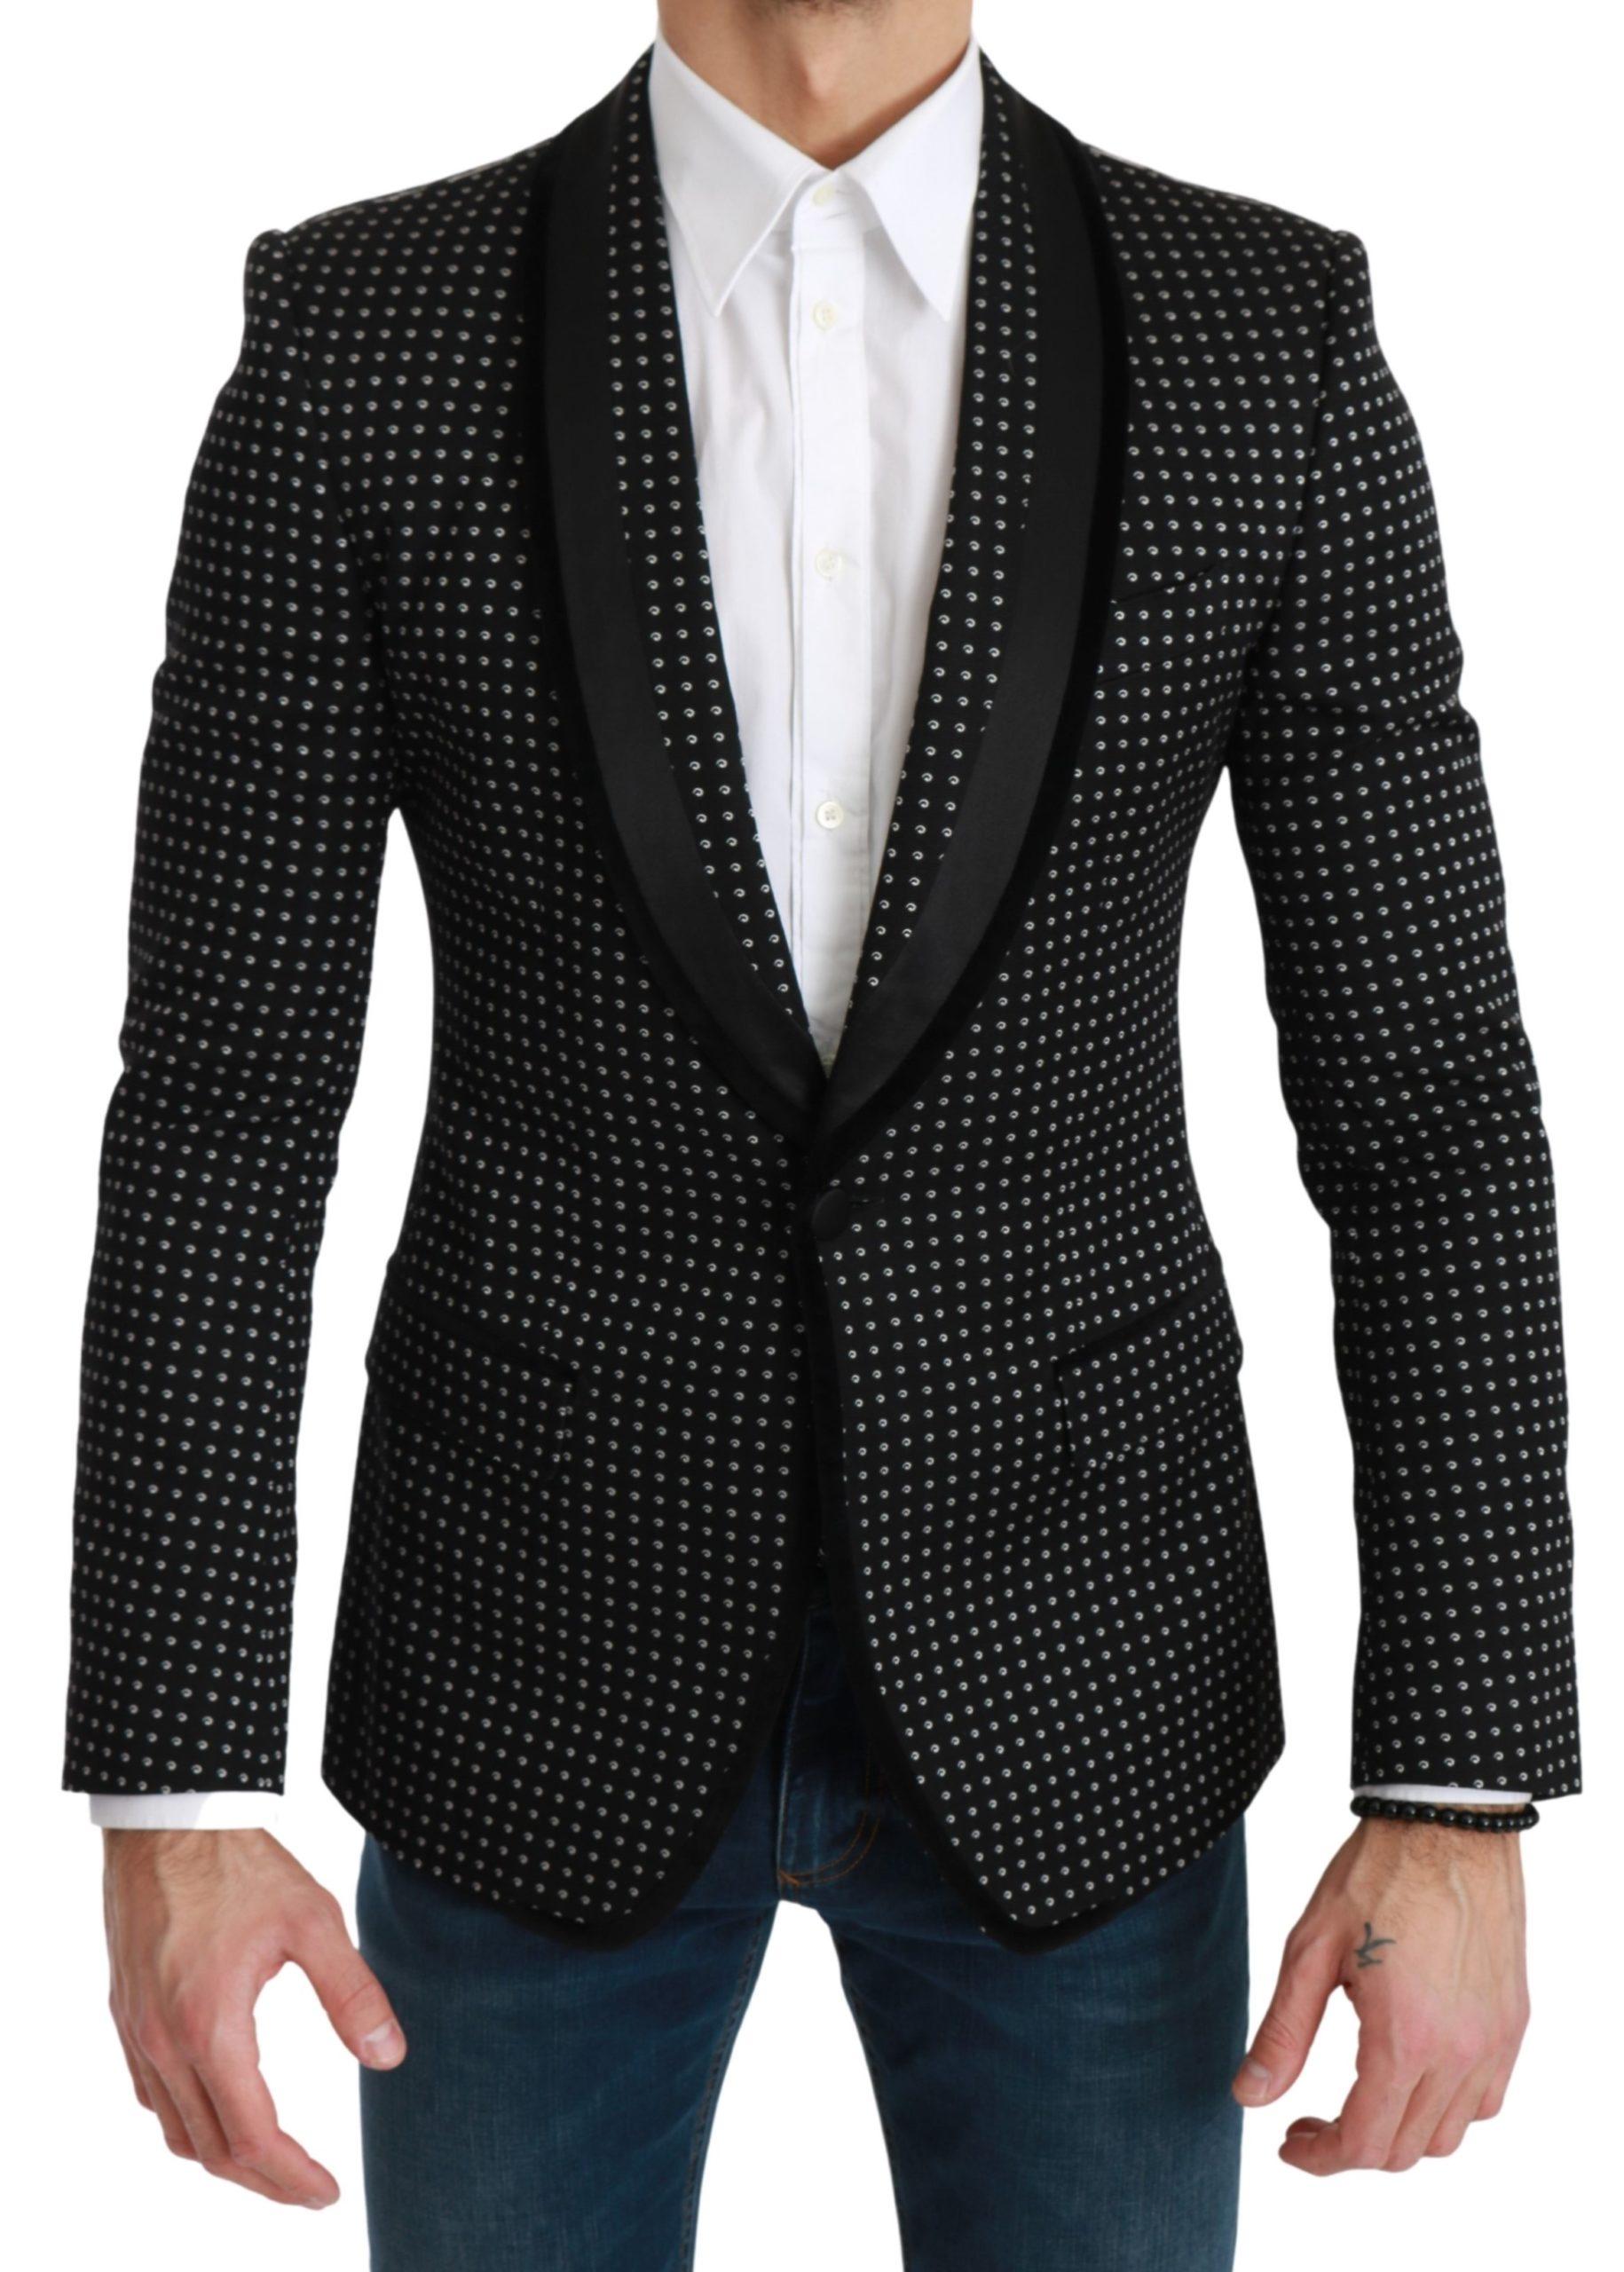 Dolce & Gabbana Men's Embroidered Single Breasted Blazer Black KOS1739 - IT46 | S